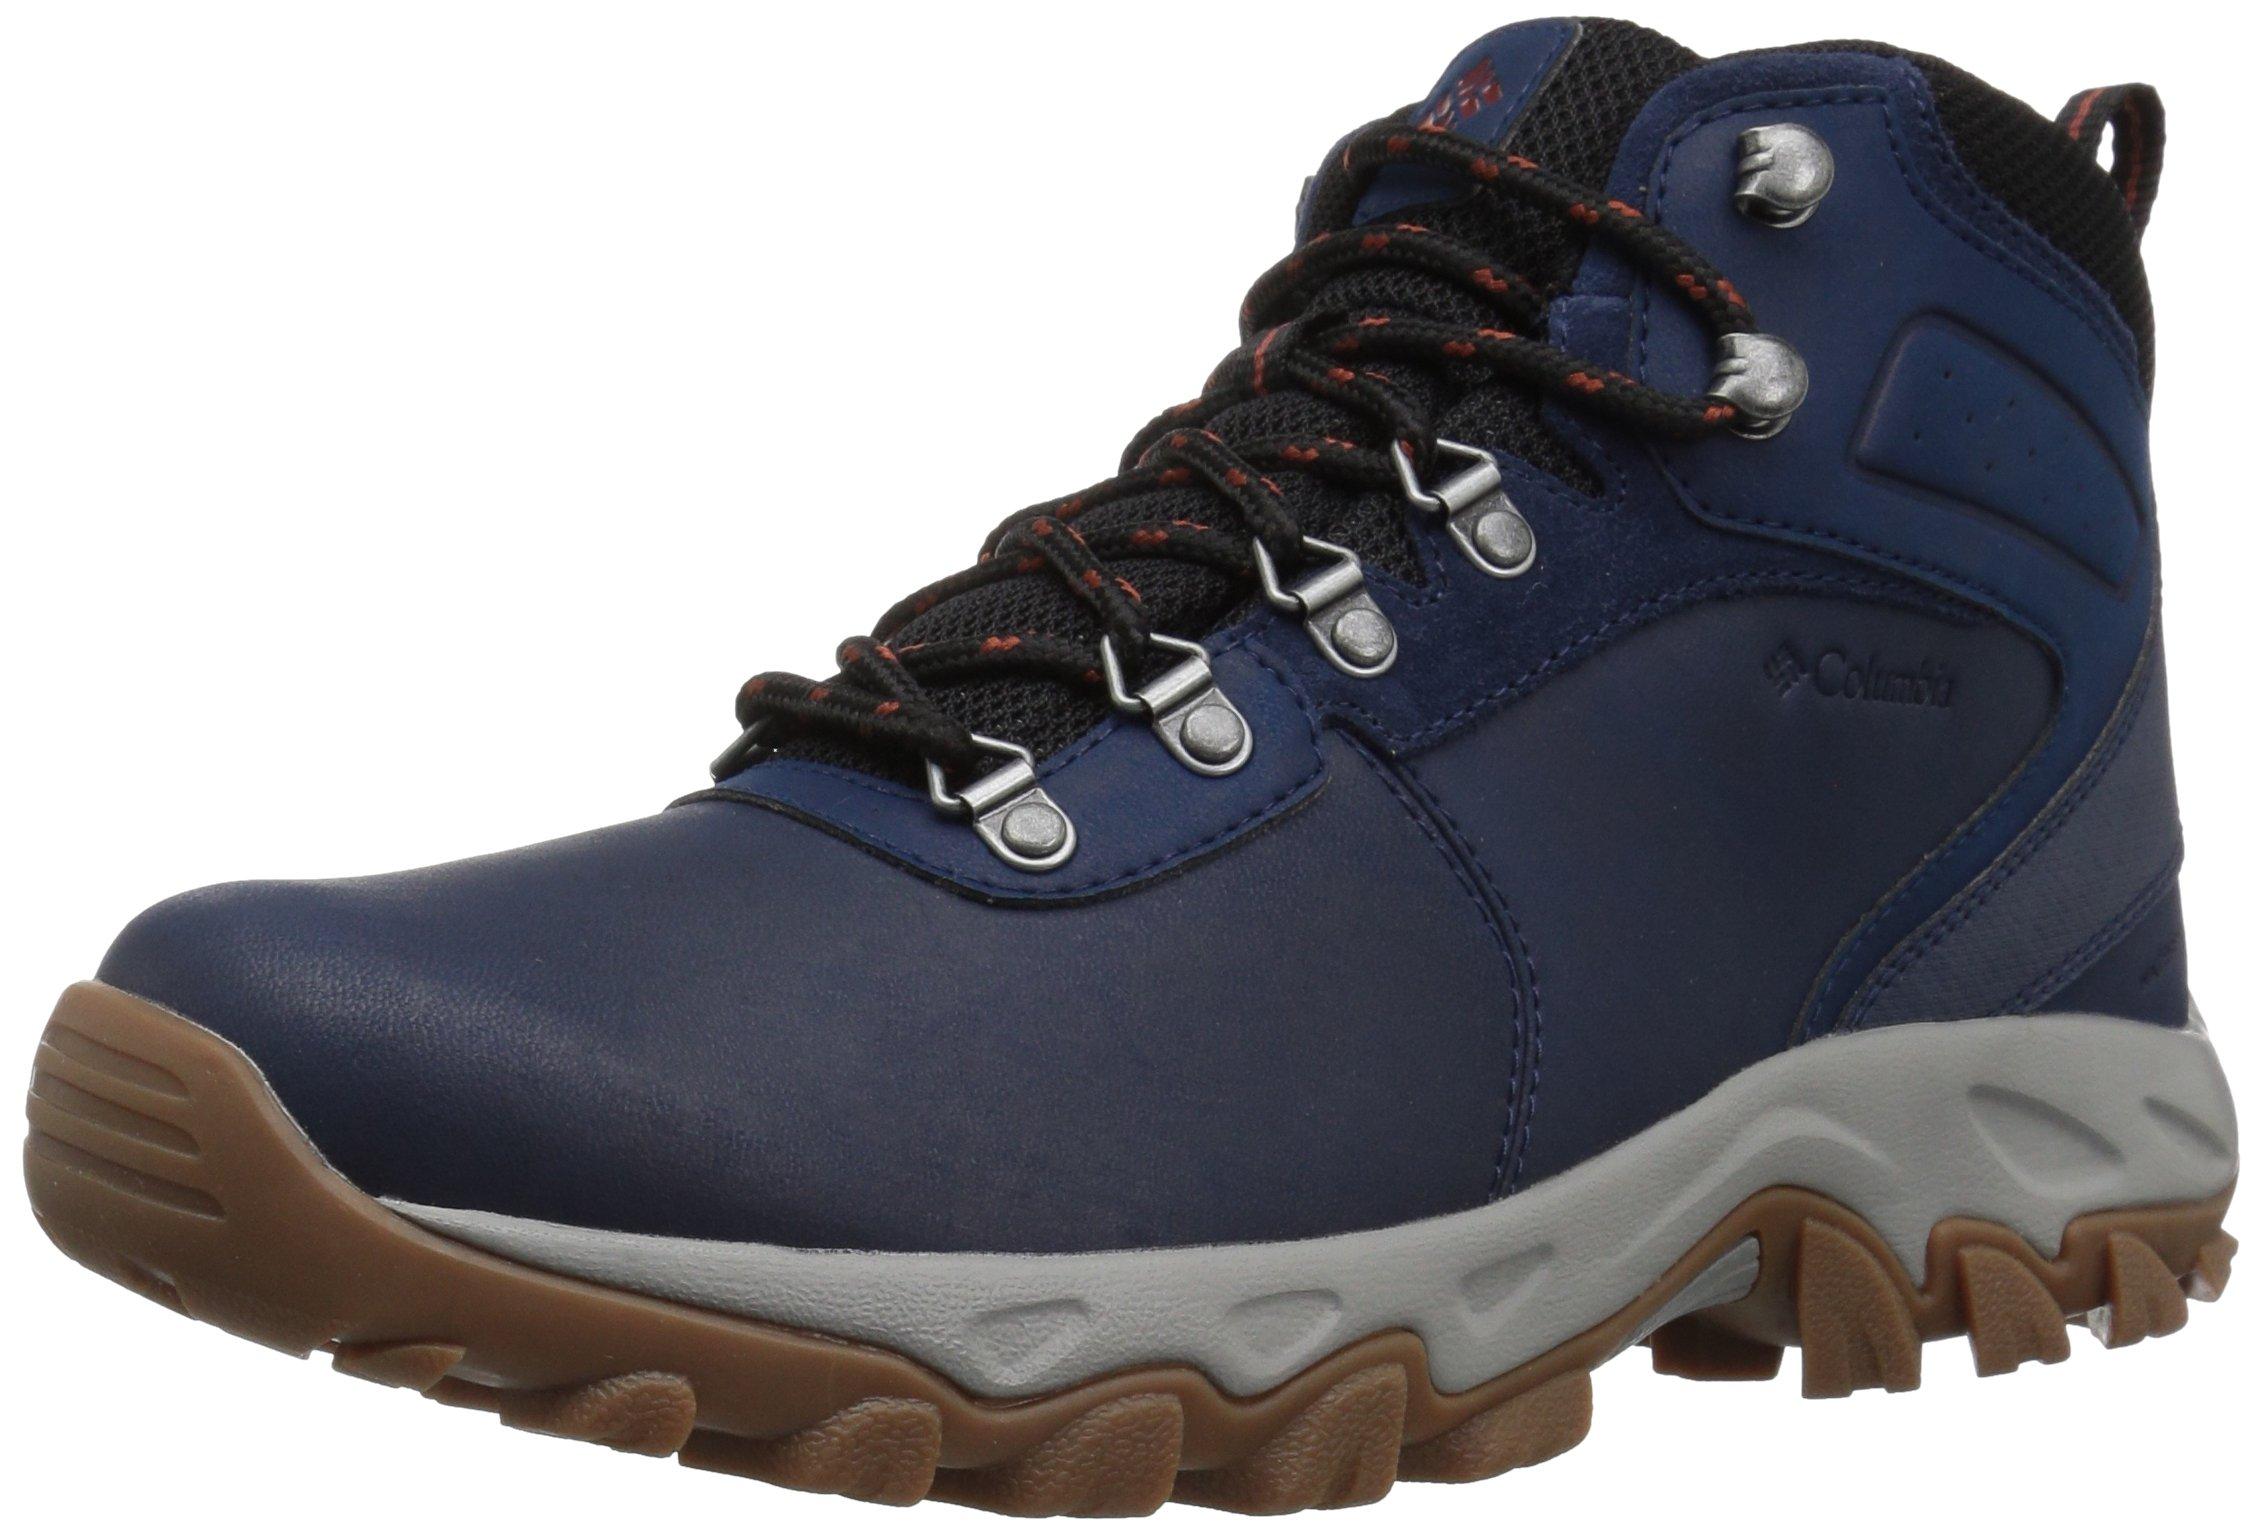 f6274670e13 Columbia Men's Newton Ridge Plus II Waterproof Ankle Boot, Collegiate Navy,  Rusty, 12 Regular US